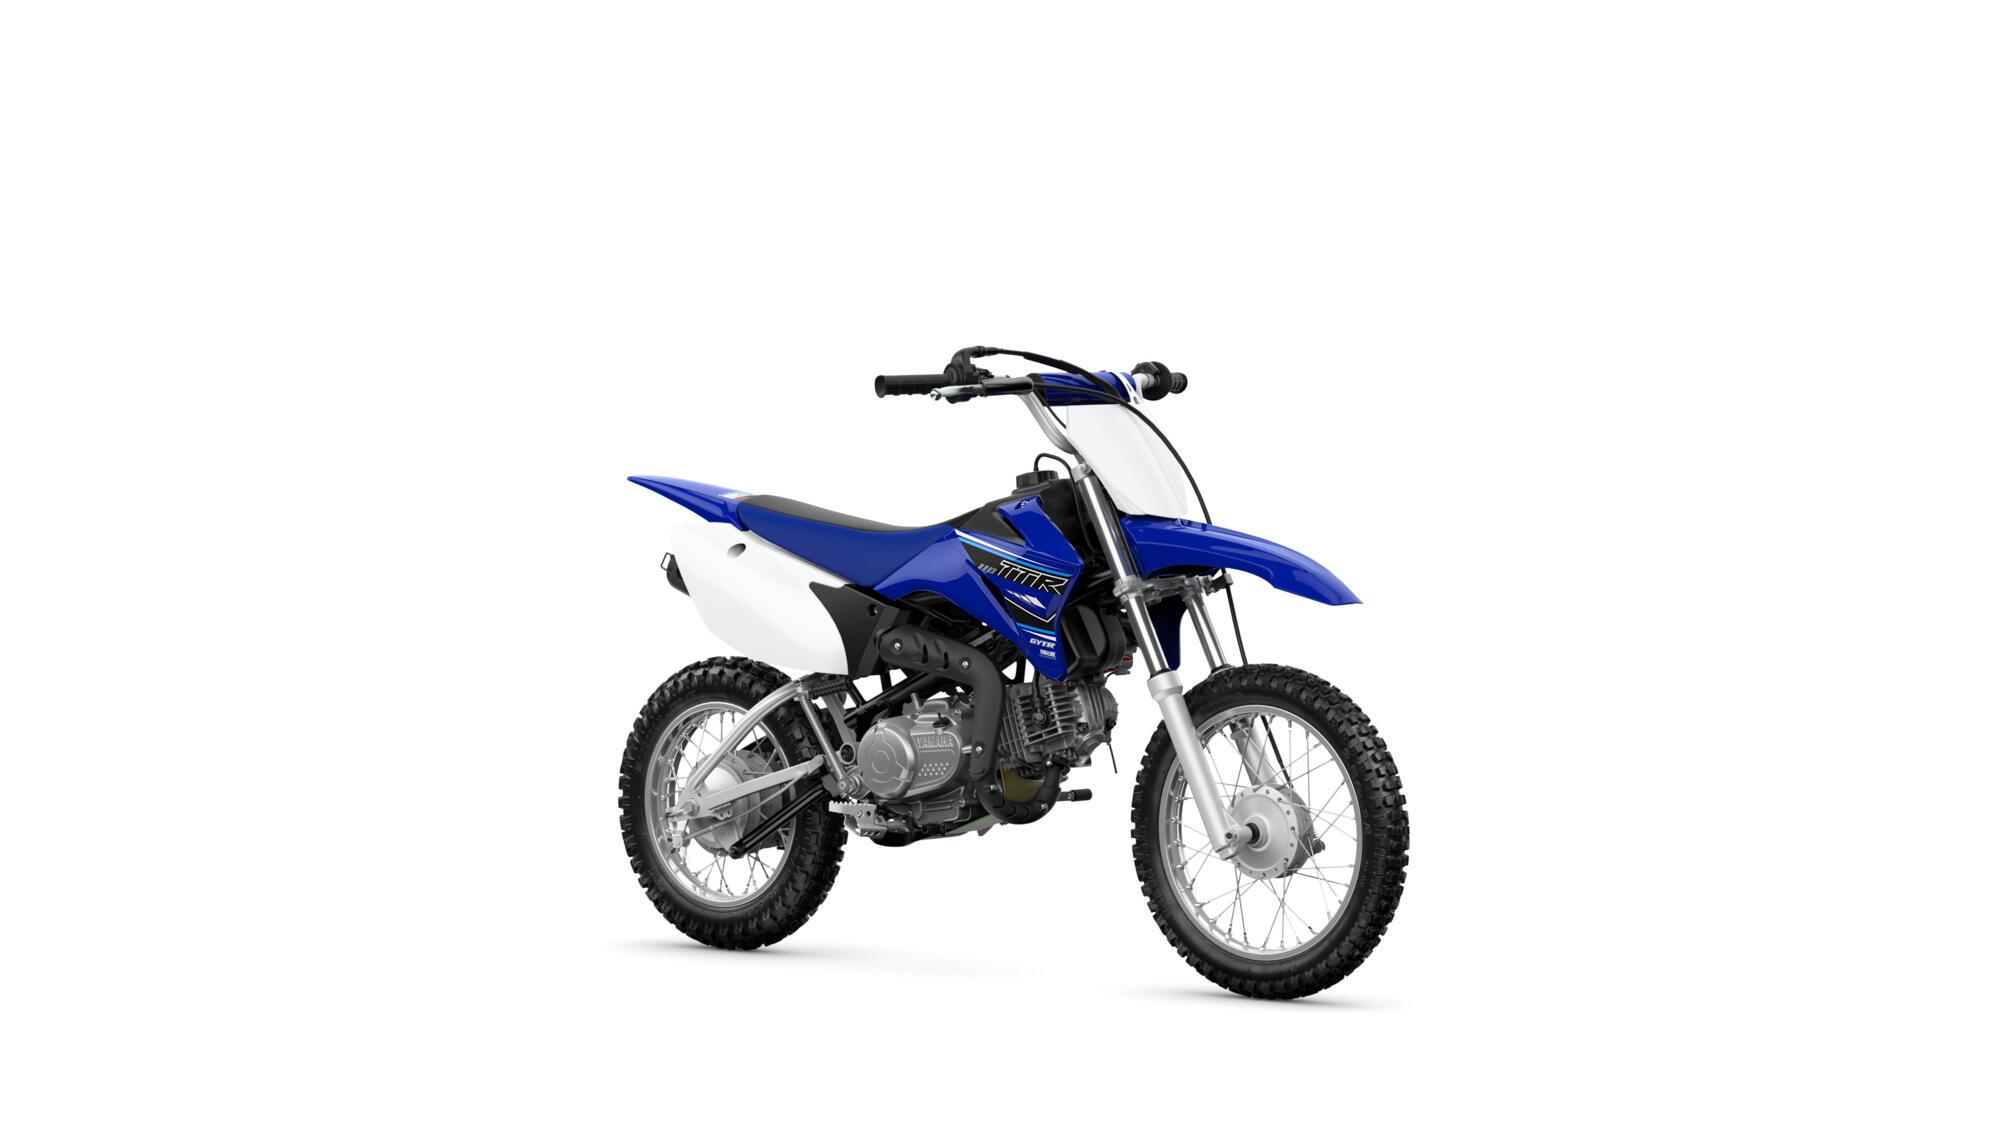 2021-Yamaha-TTR110-EU-Icon_Blue-Studio-001-03